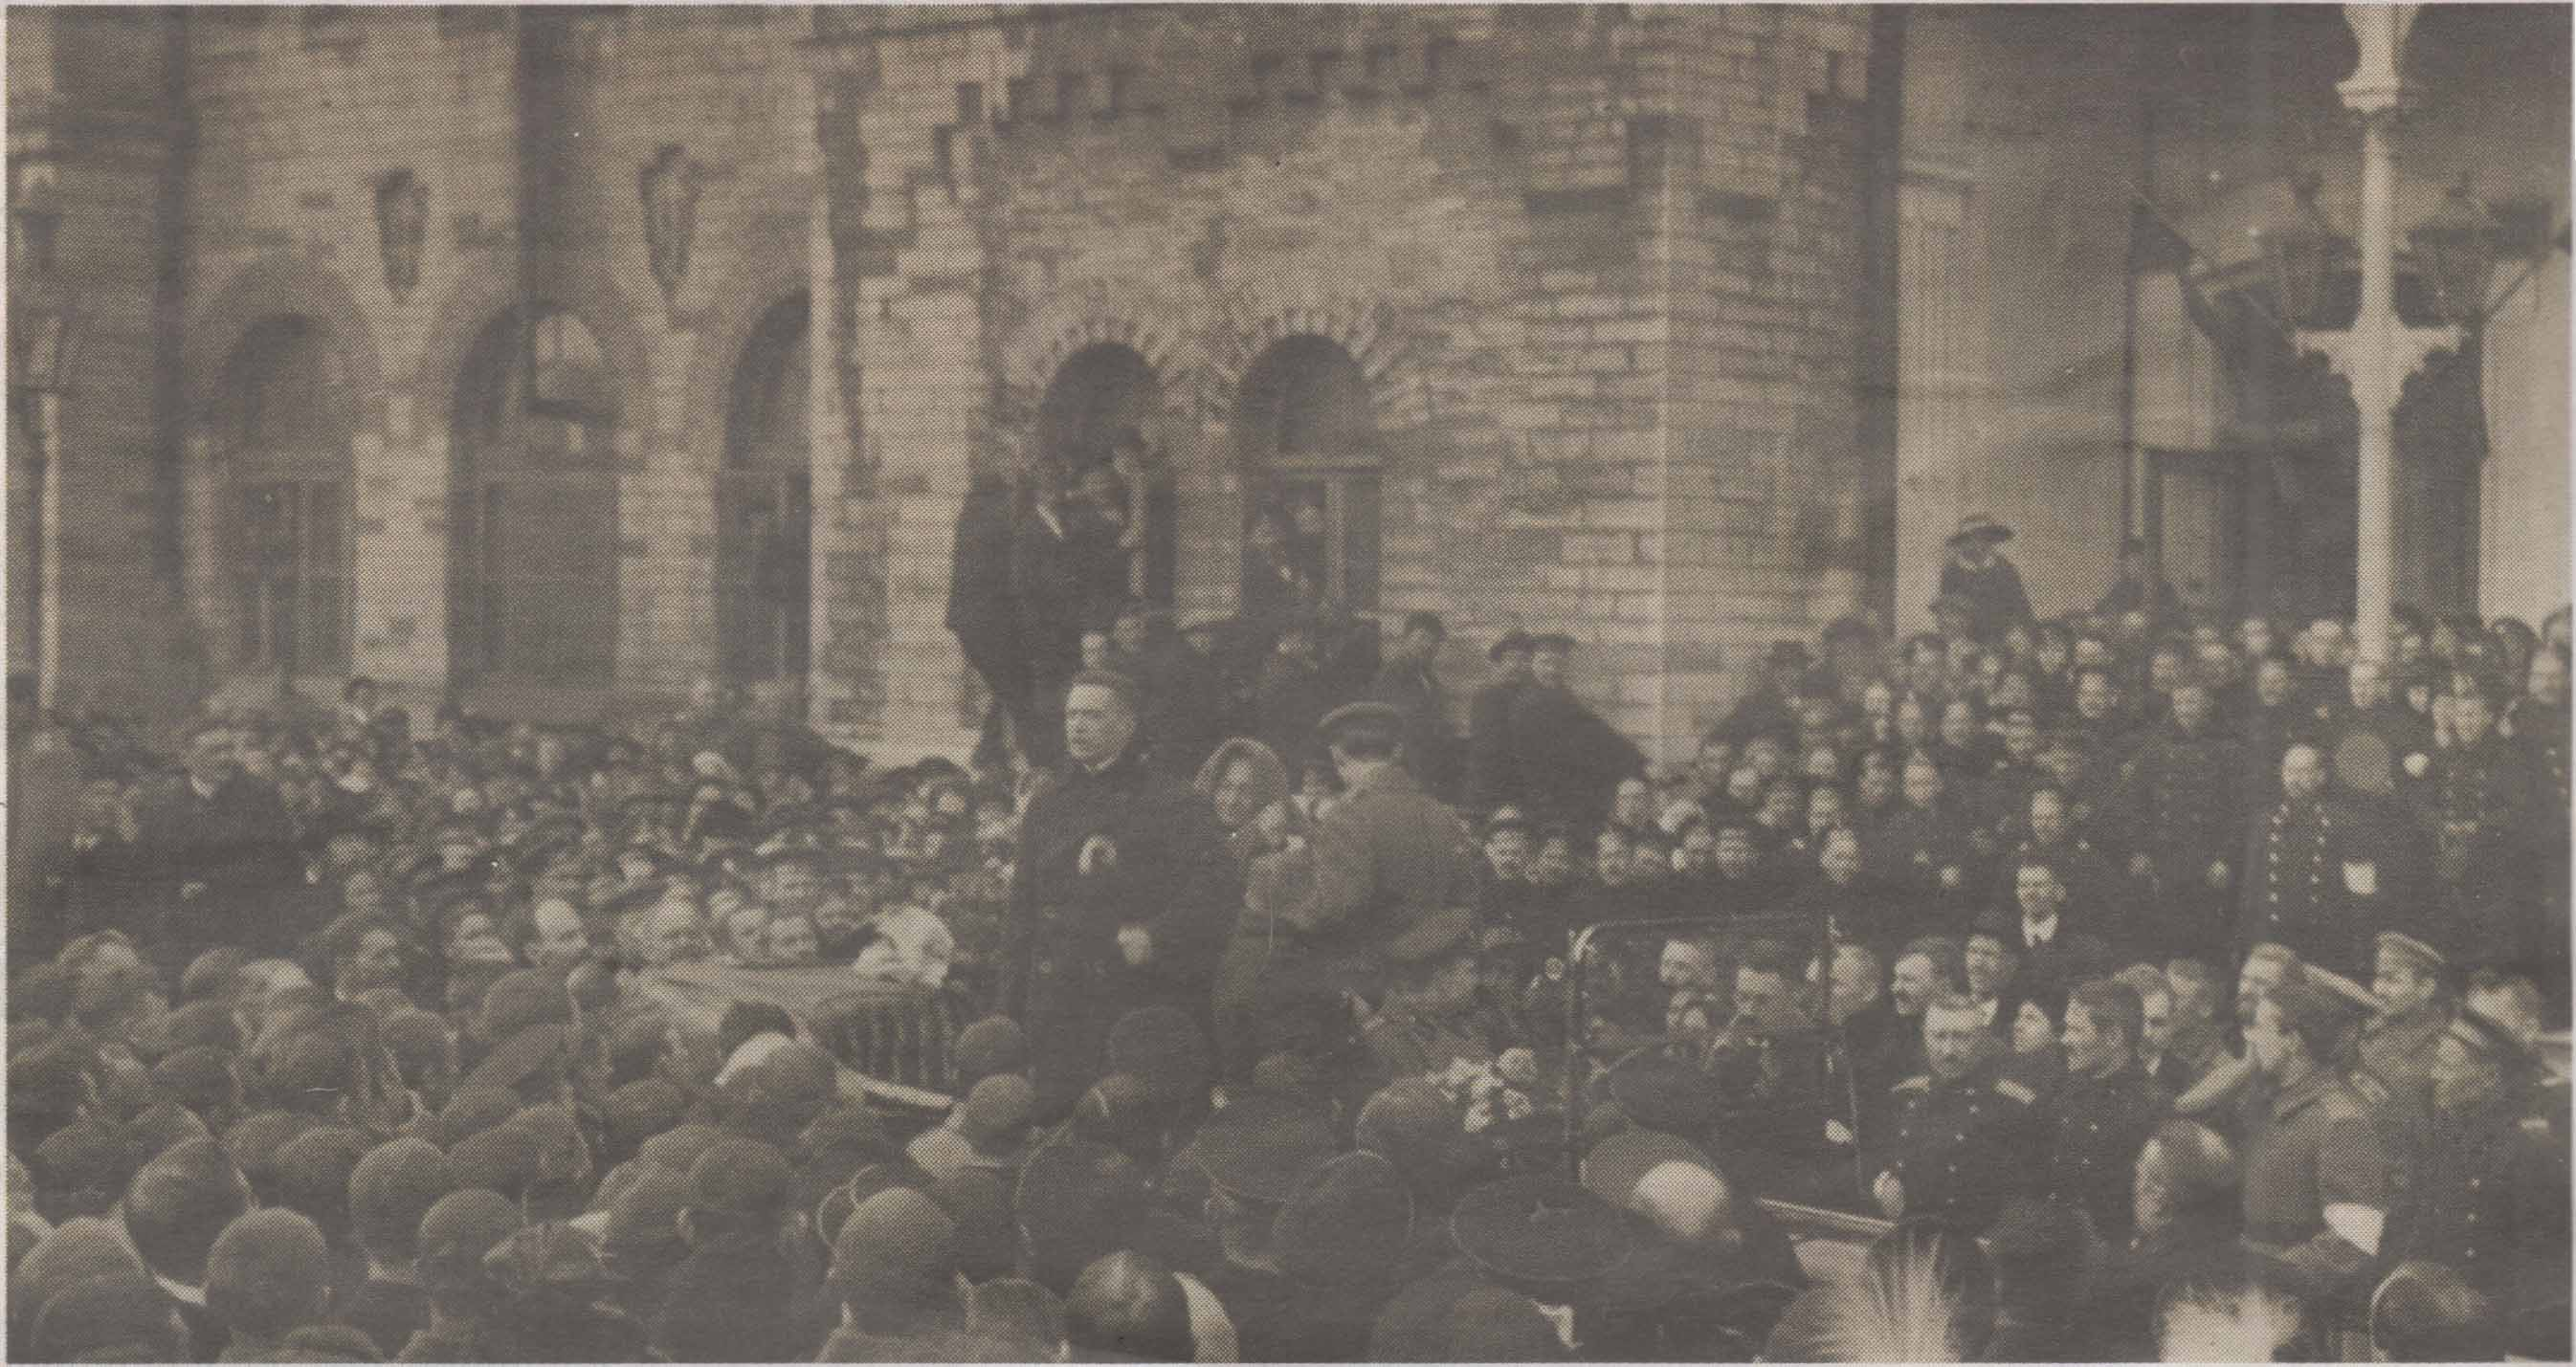 Встреча Александра Керенского на площади перед Балтийским вокзалом в Ревеле.